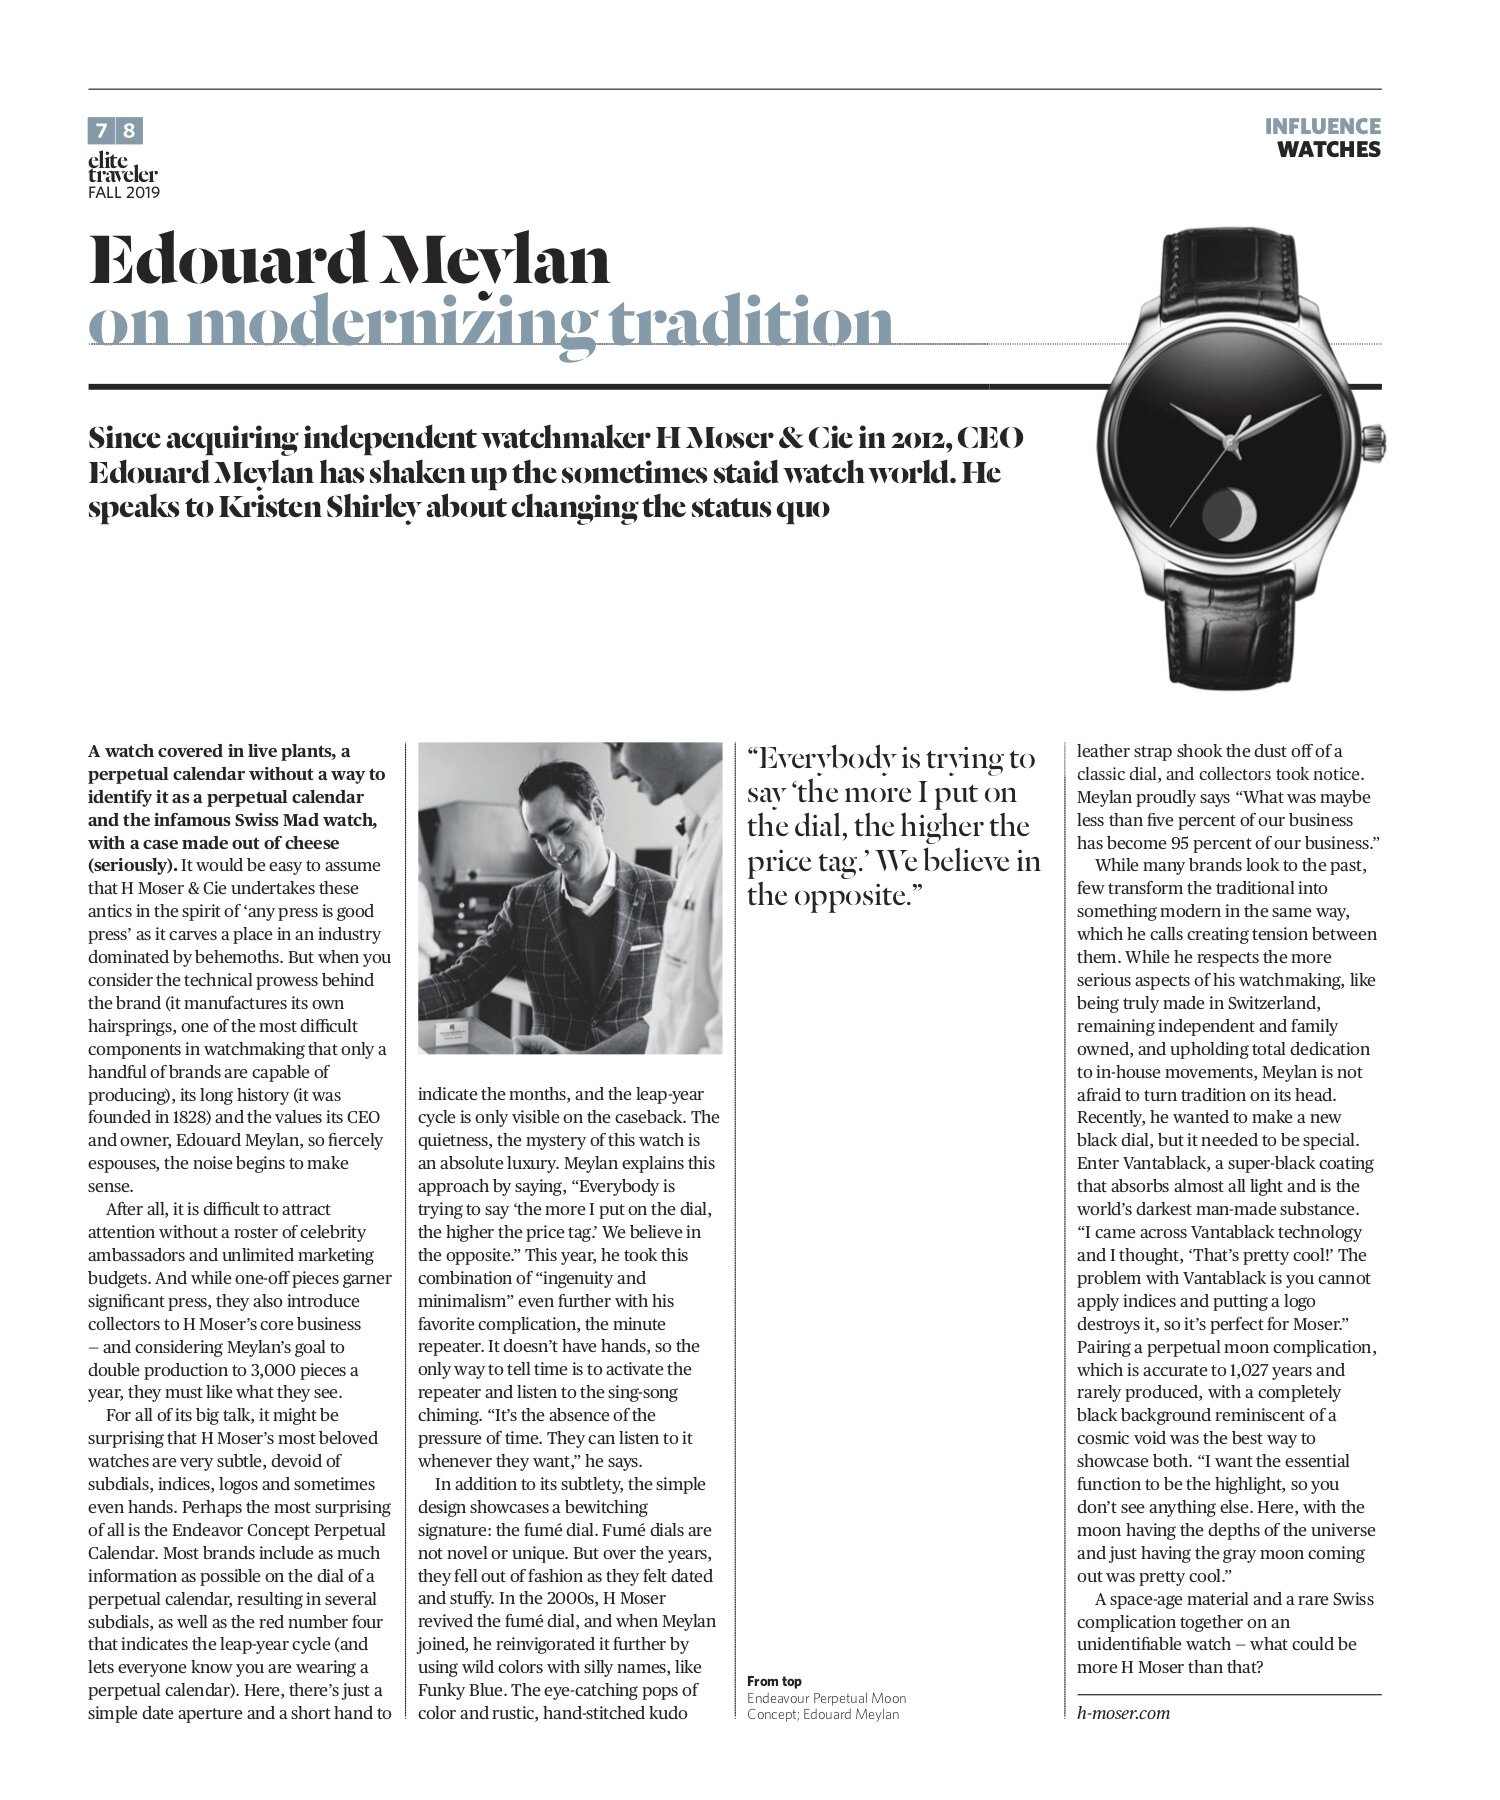 Edouard Meylan, CEO of H Moser & Cie